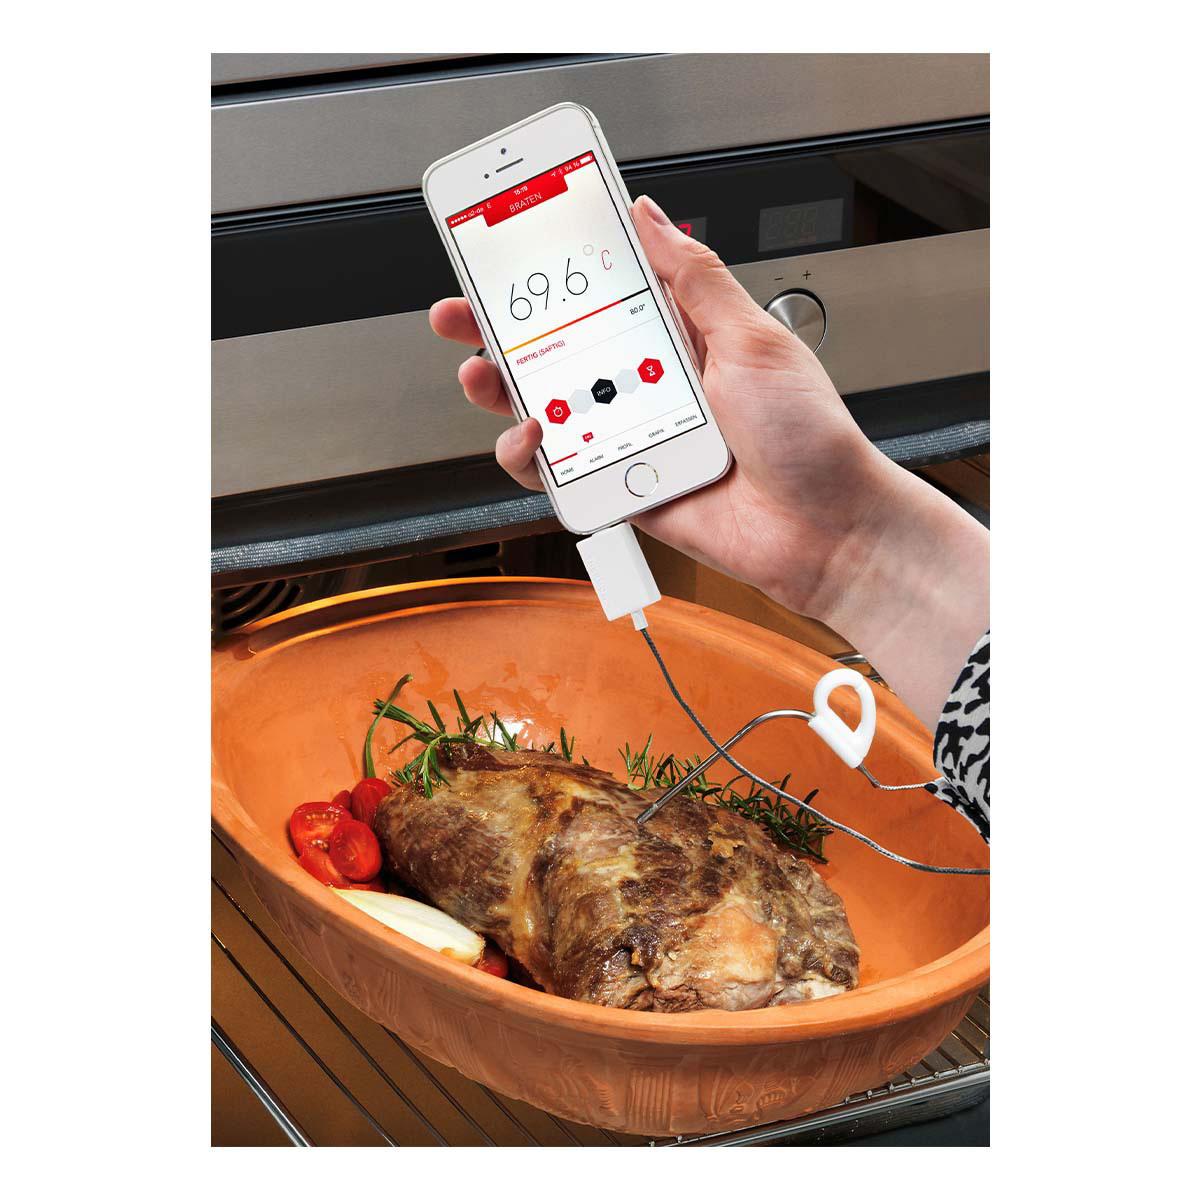 14-1505-01-gourmet-thermometer-für-smartphones-thermowire-anwendung-1200x1200px.jpg